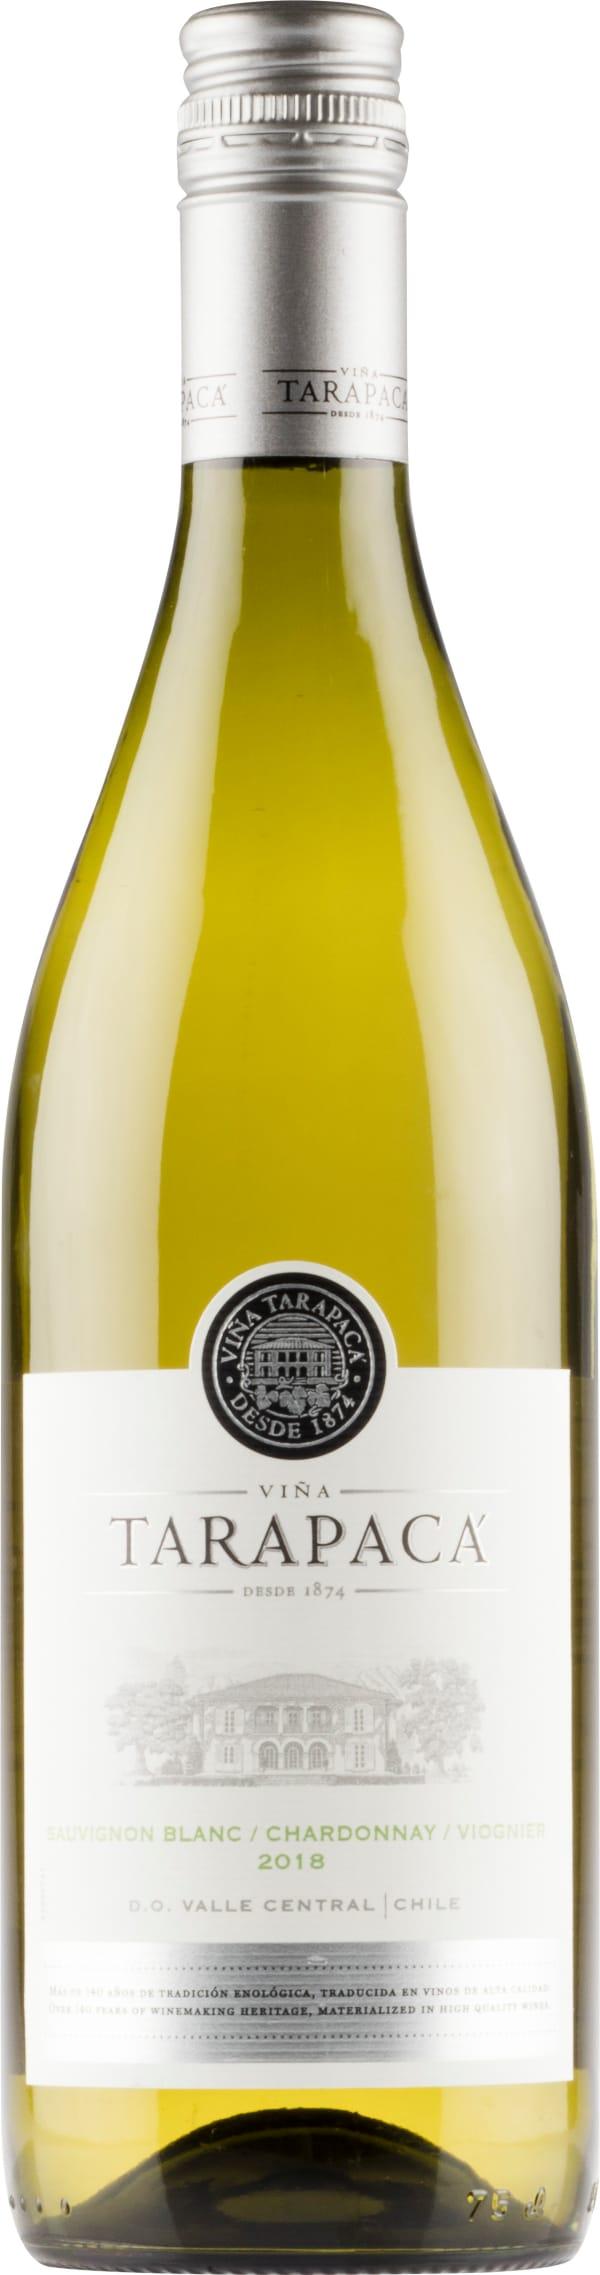 Tarapacá Sauvignon Blanc Chardonnay Viognier 2018